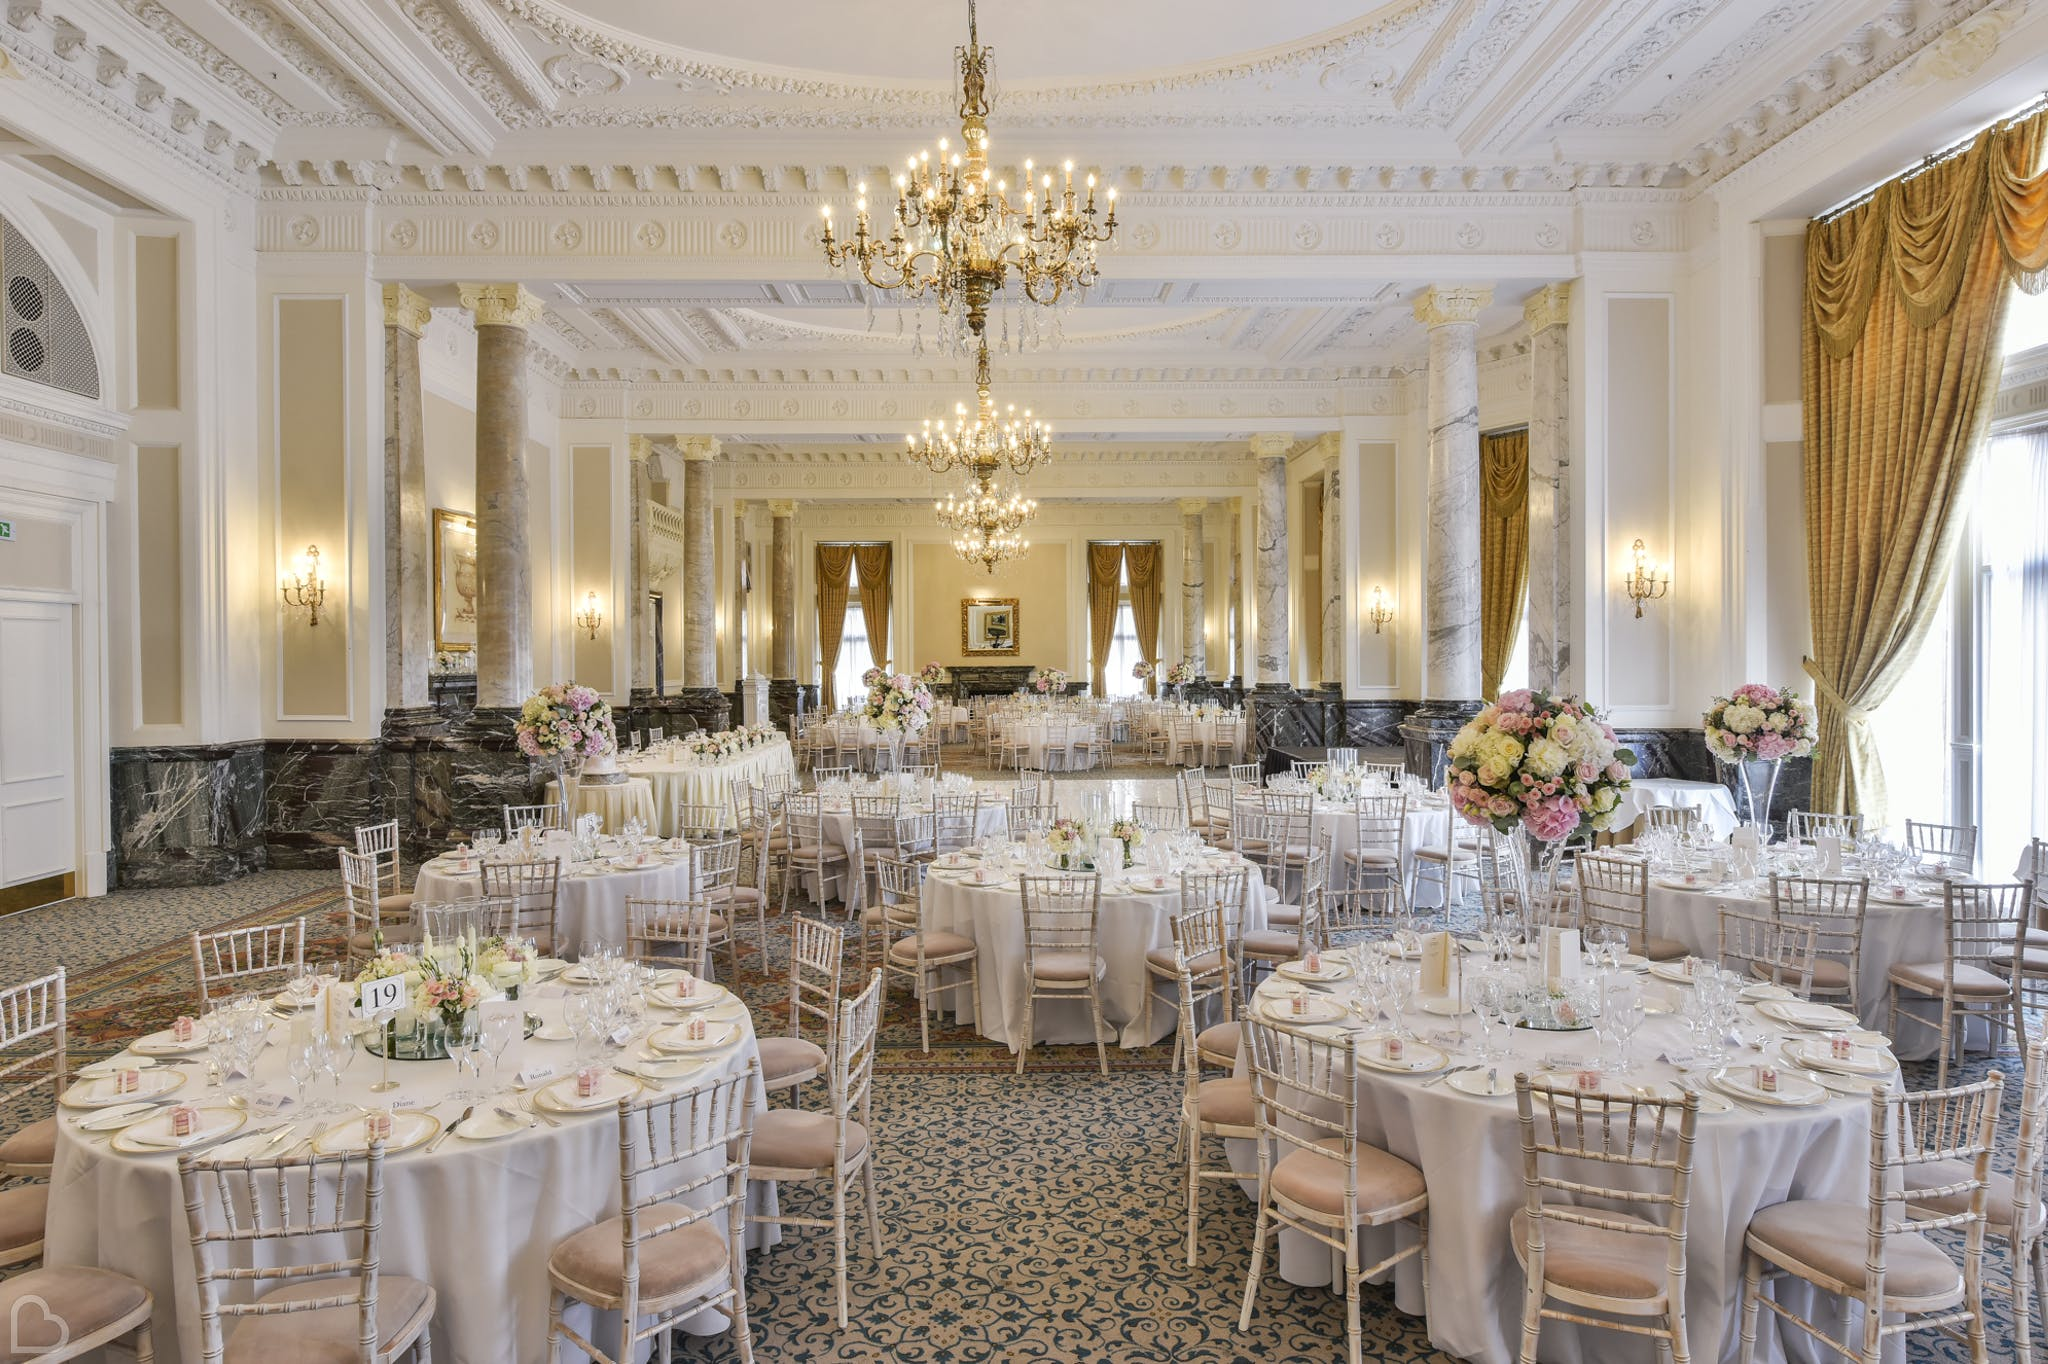 The landmark a wedding reception venue in london, ready to host a wedding lunch